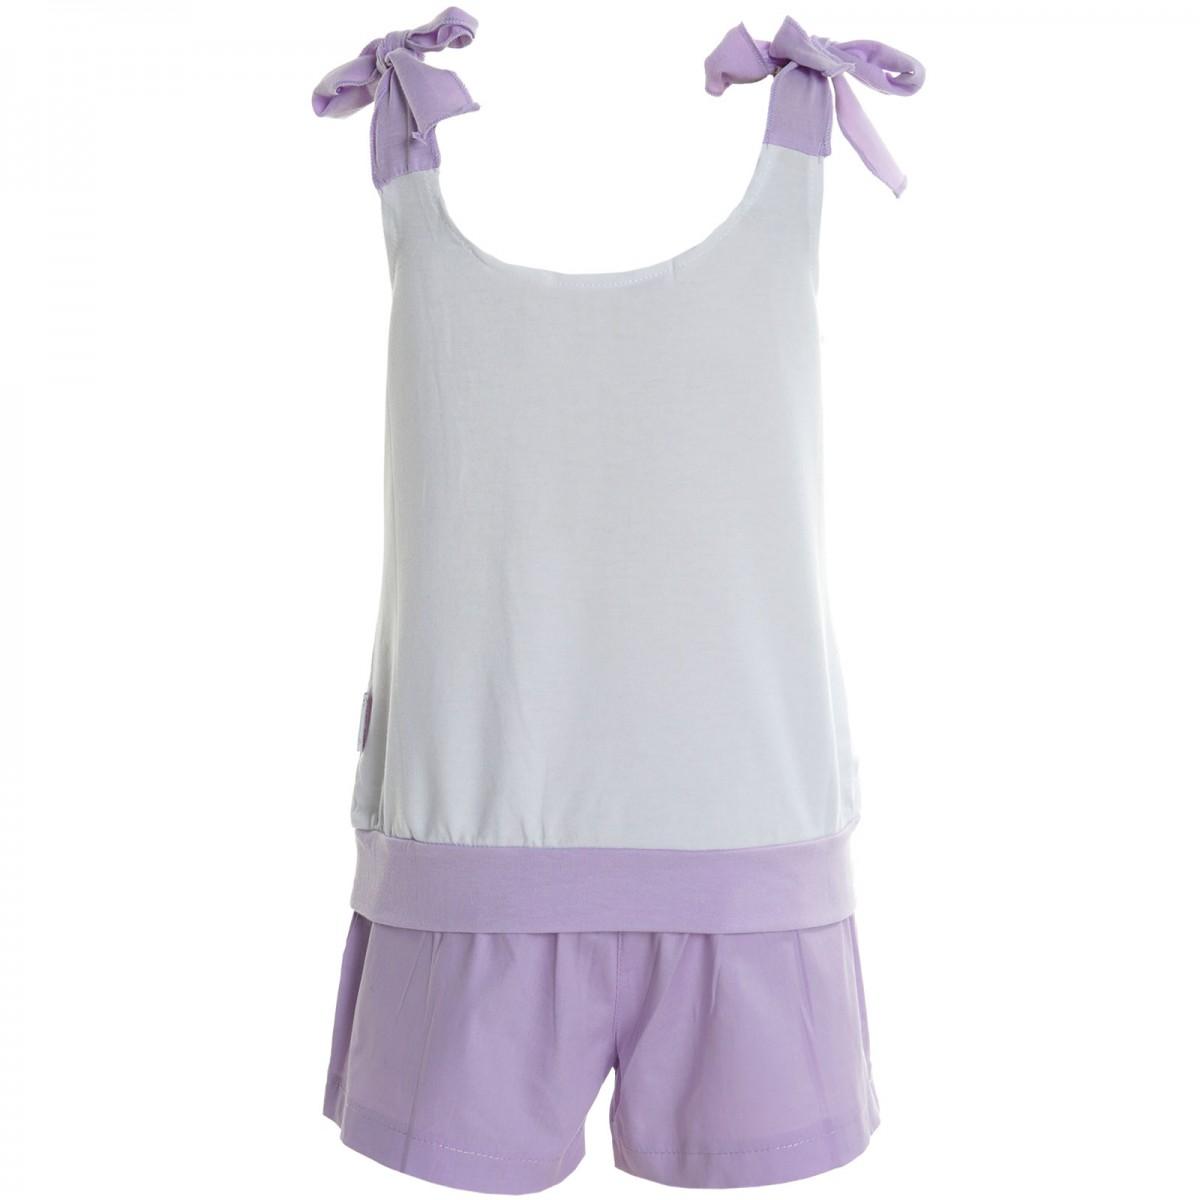 Kinder Mädchen Shorts Tank Top T-Shirt Kurze Capri Hose Outfit 2Tlg Set 20468